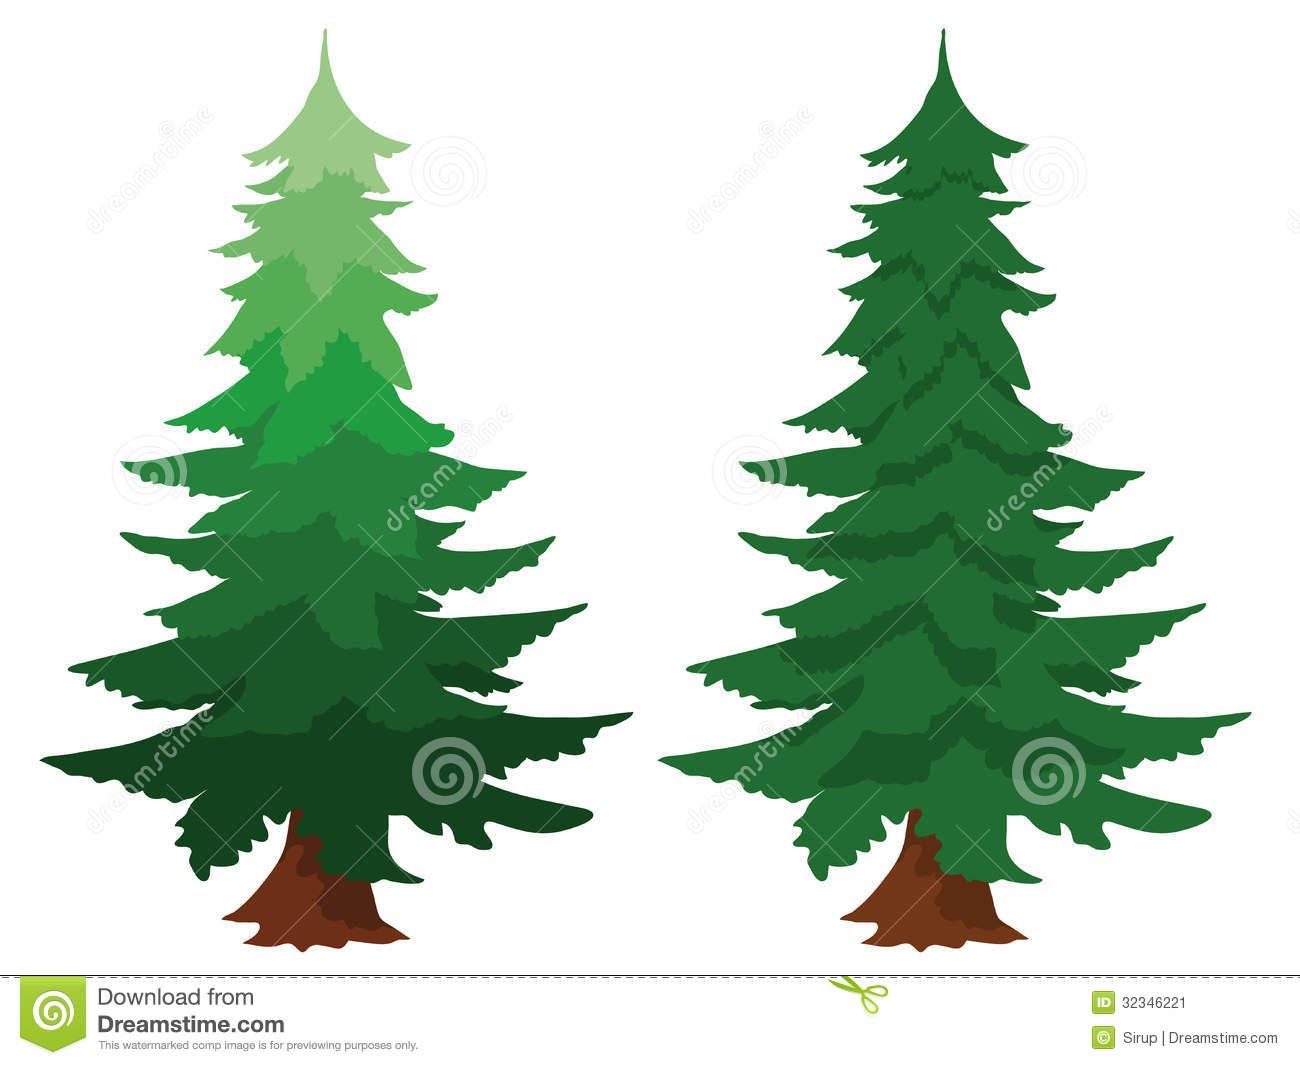 Image of Evergreen Fir Tree Clipart.